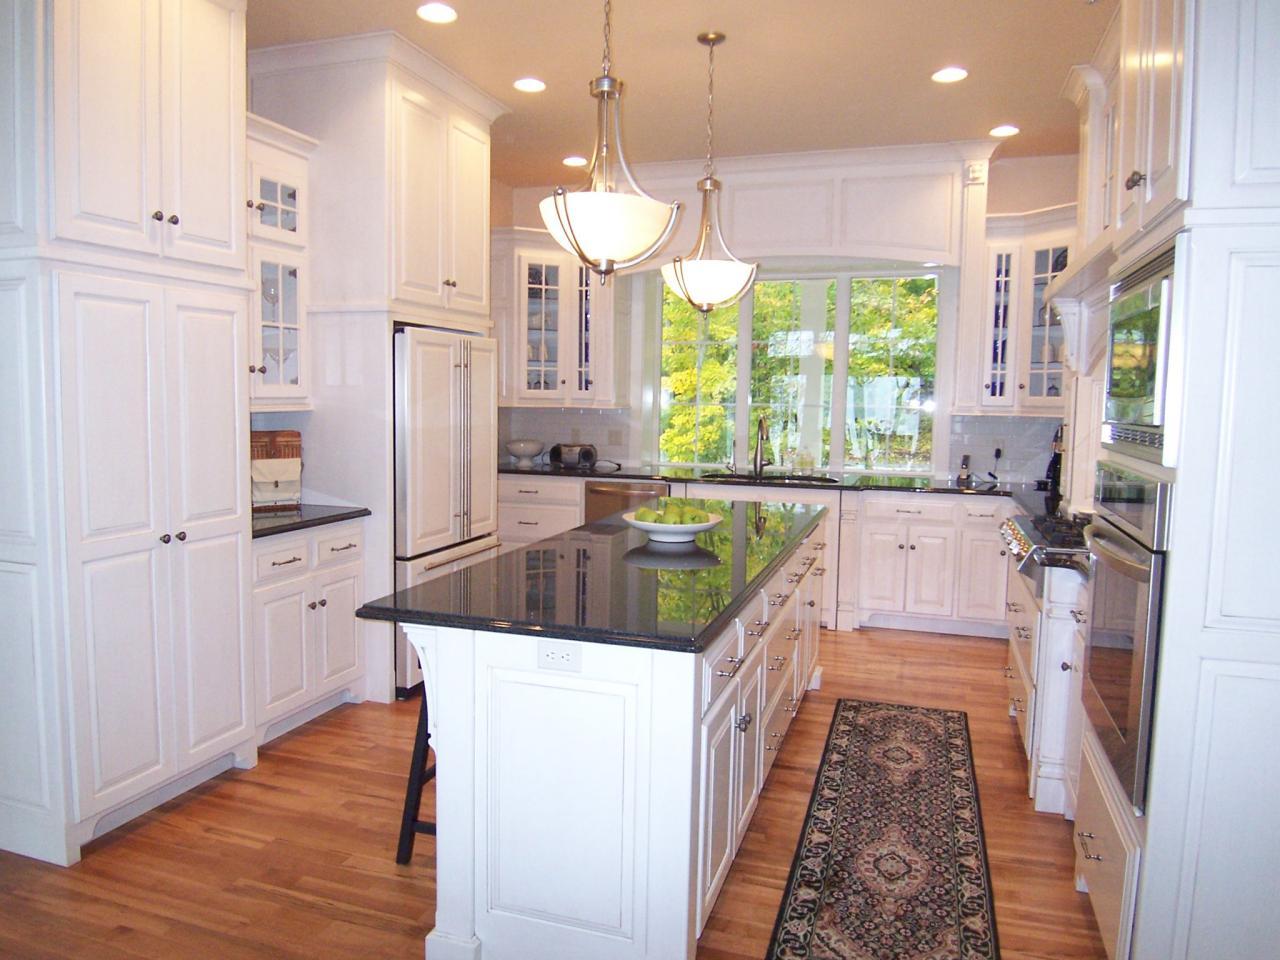 kitchen remodel u shaped kitchen photo - 8